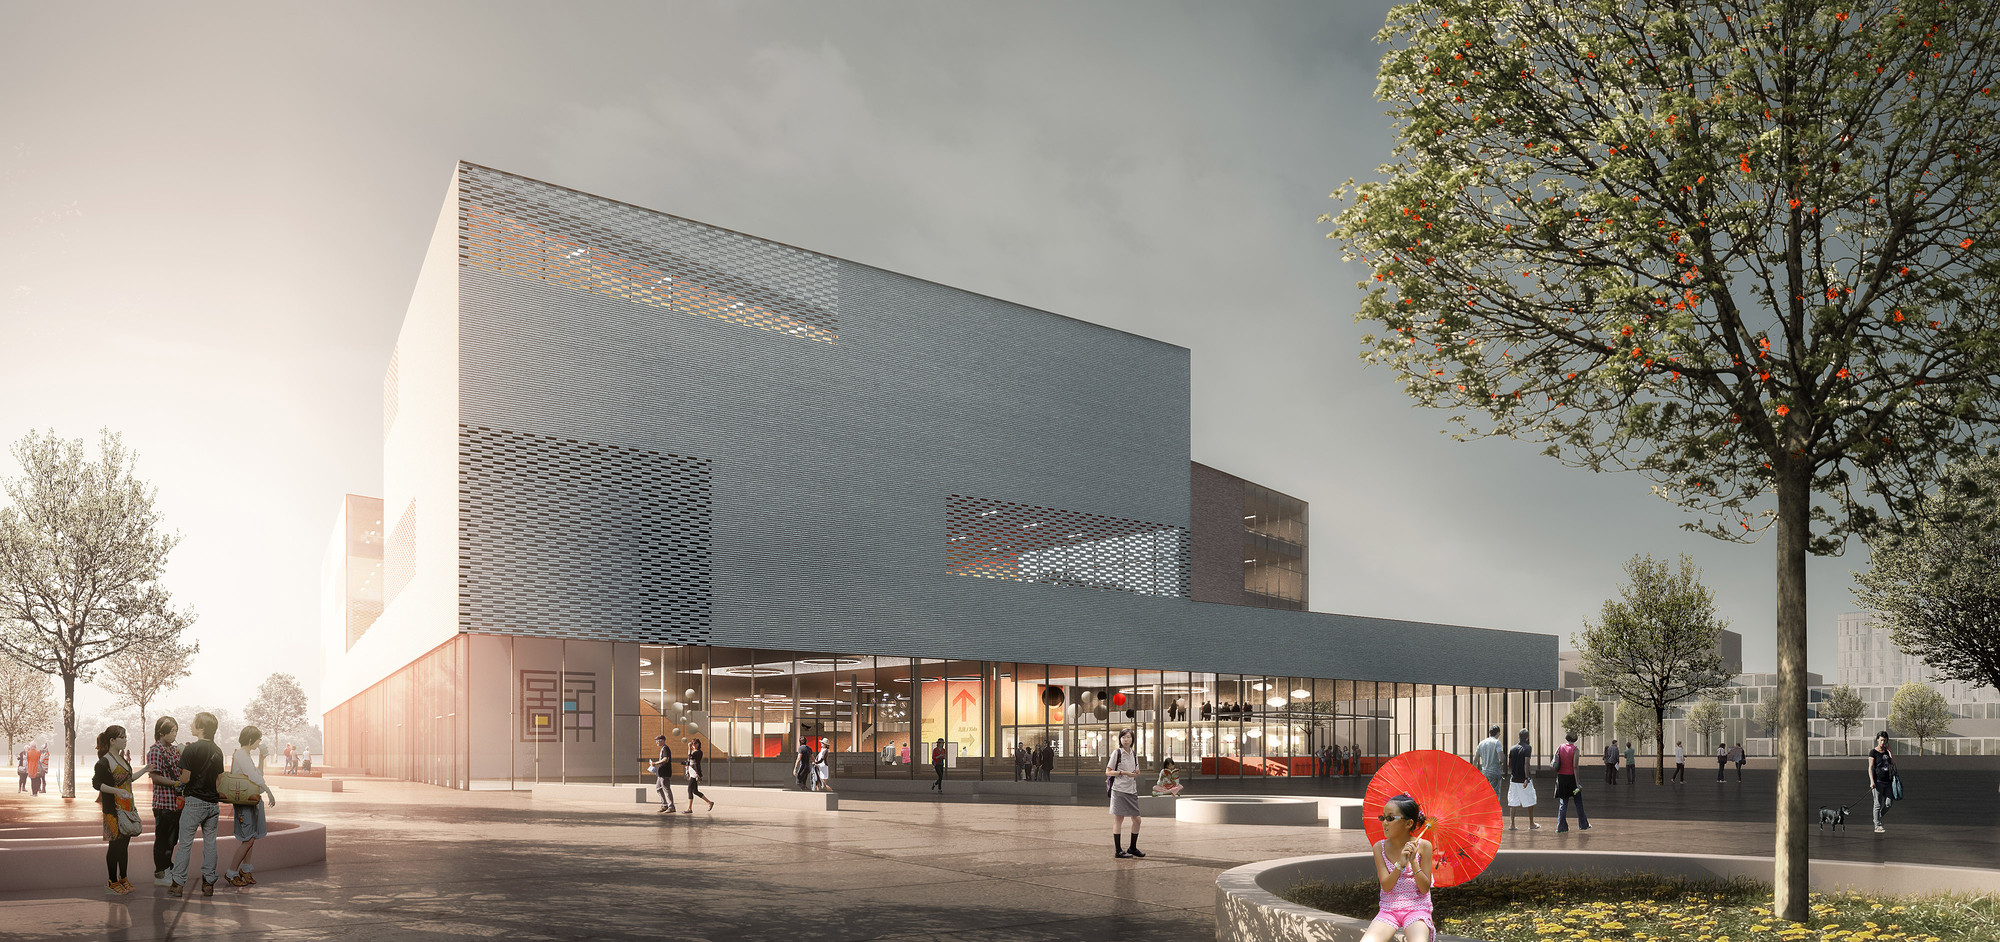 schmidt hammer lassen Wins Competition to Design Ningbo's New Central Library, © schmidt hammer lassen architects